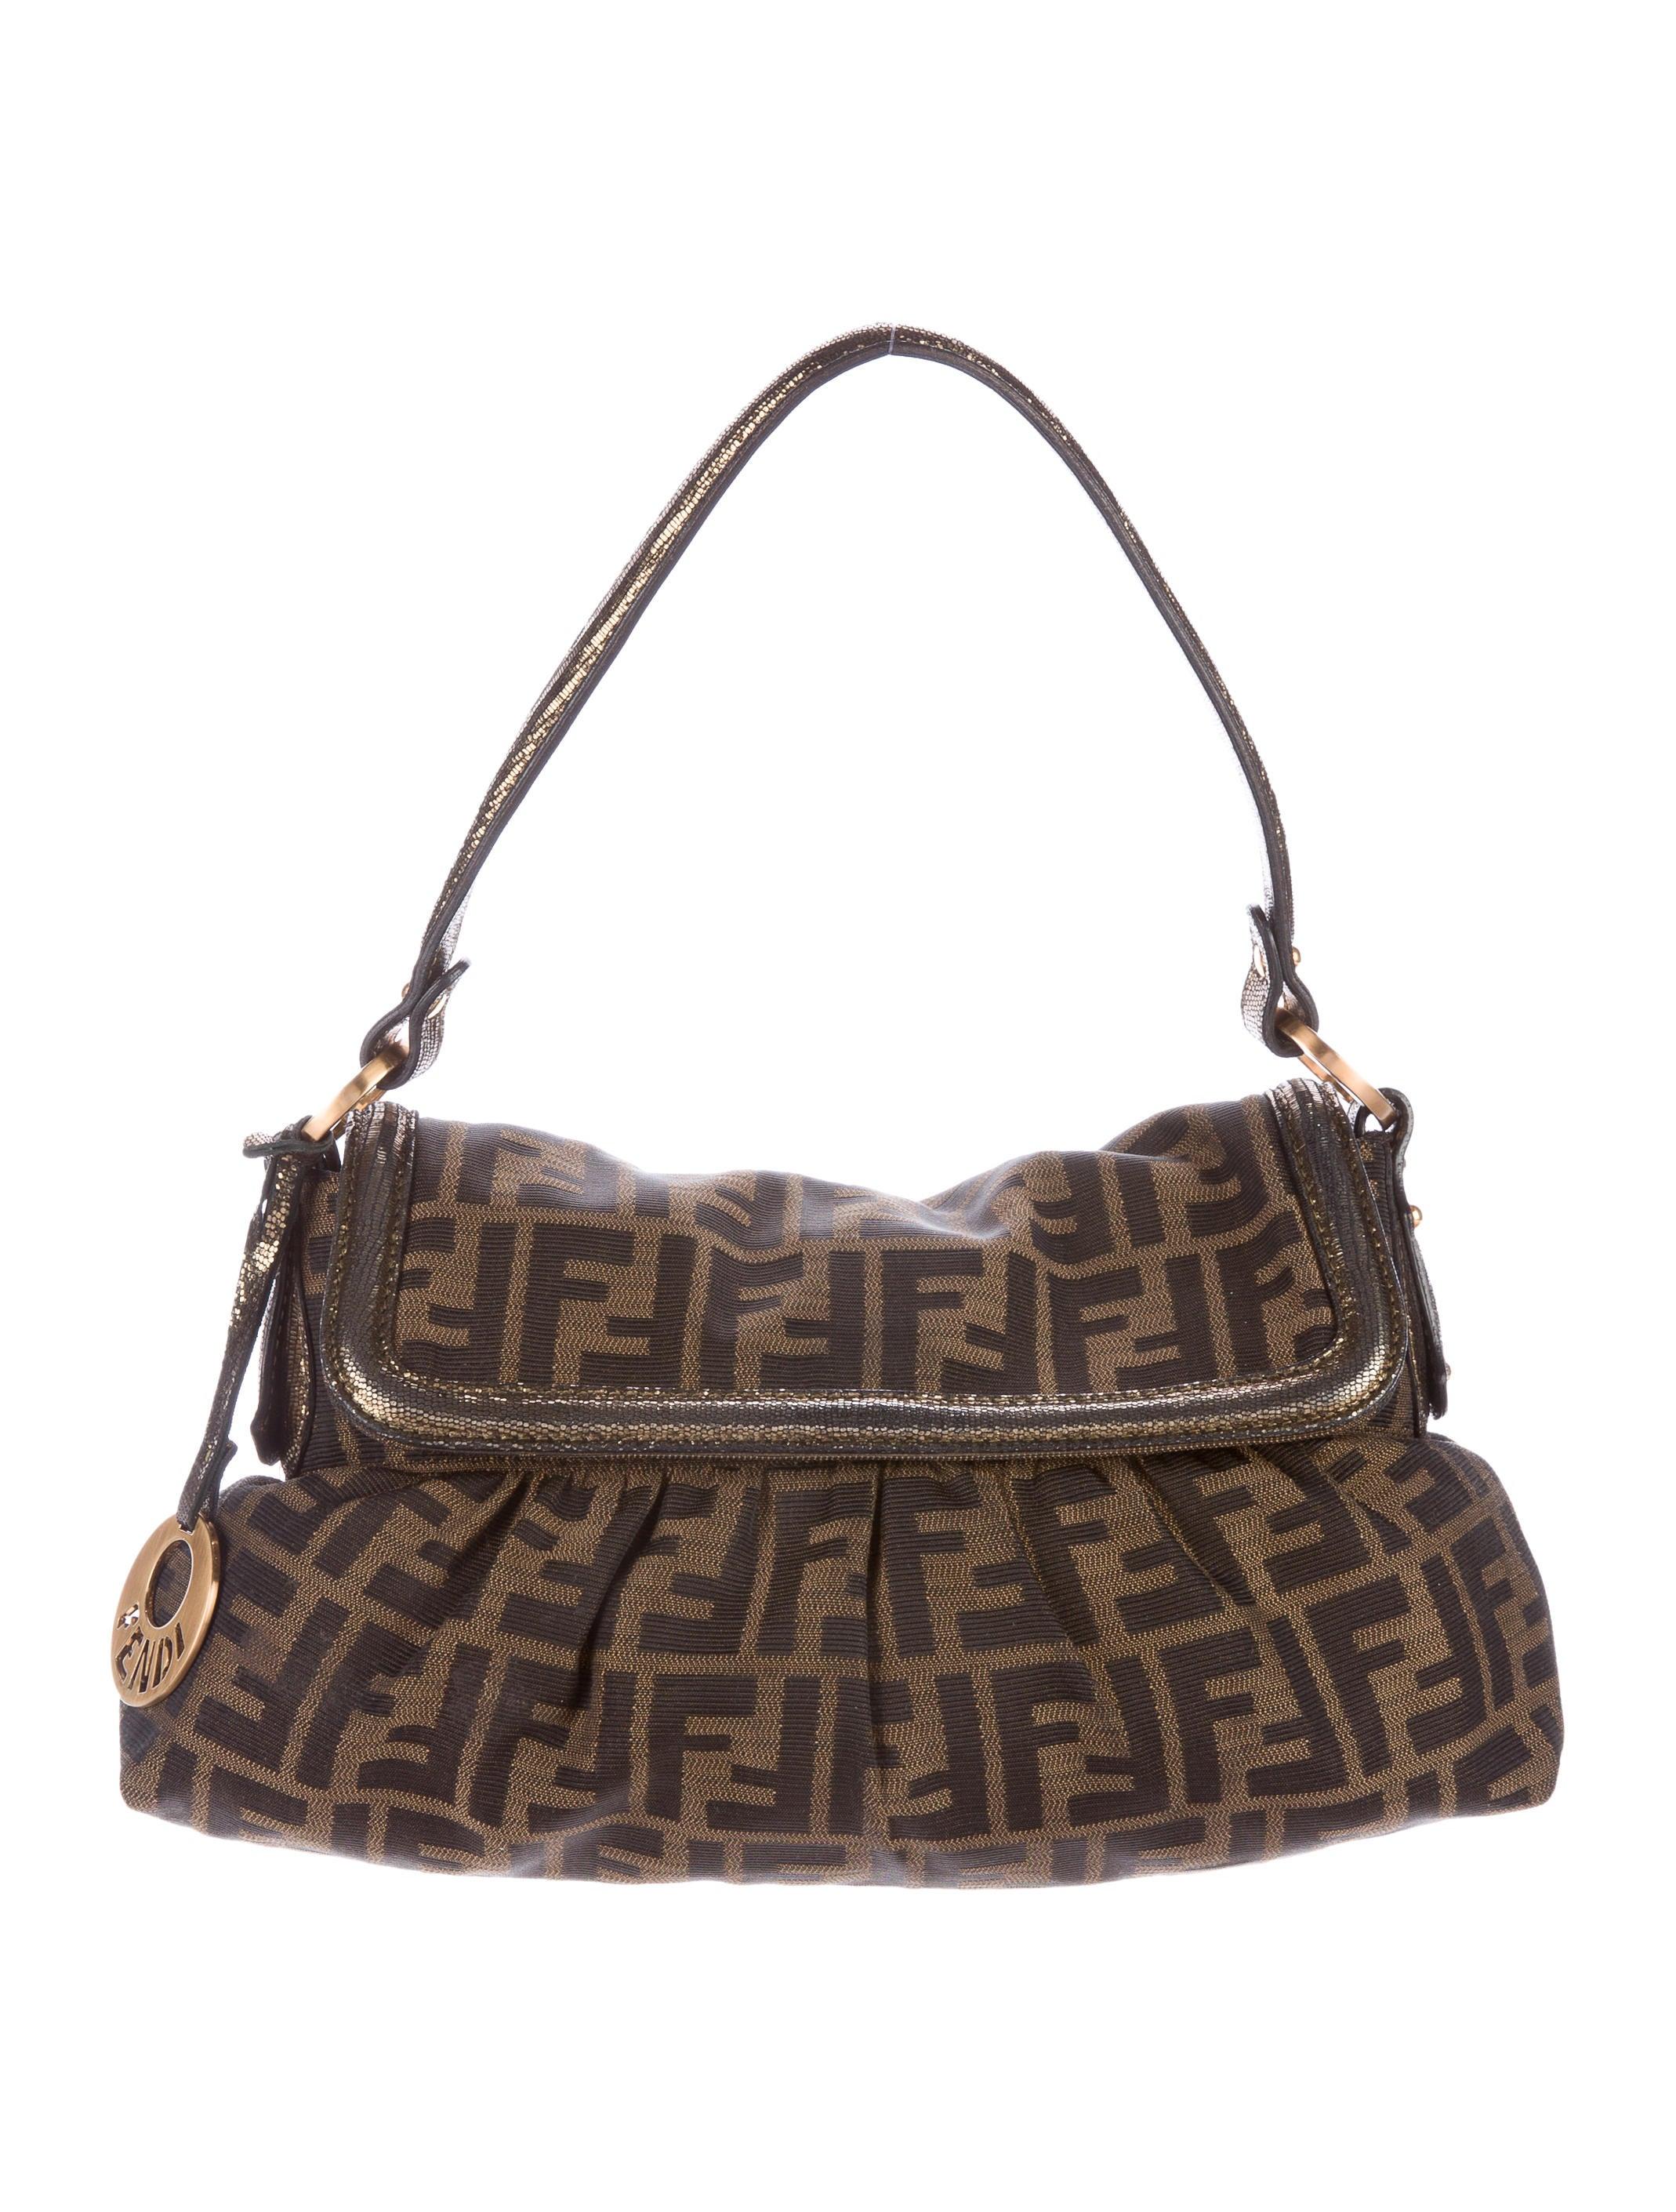 Fendi Peekaboo Essentially Bag Italy Replica Bags ...